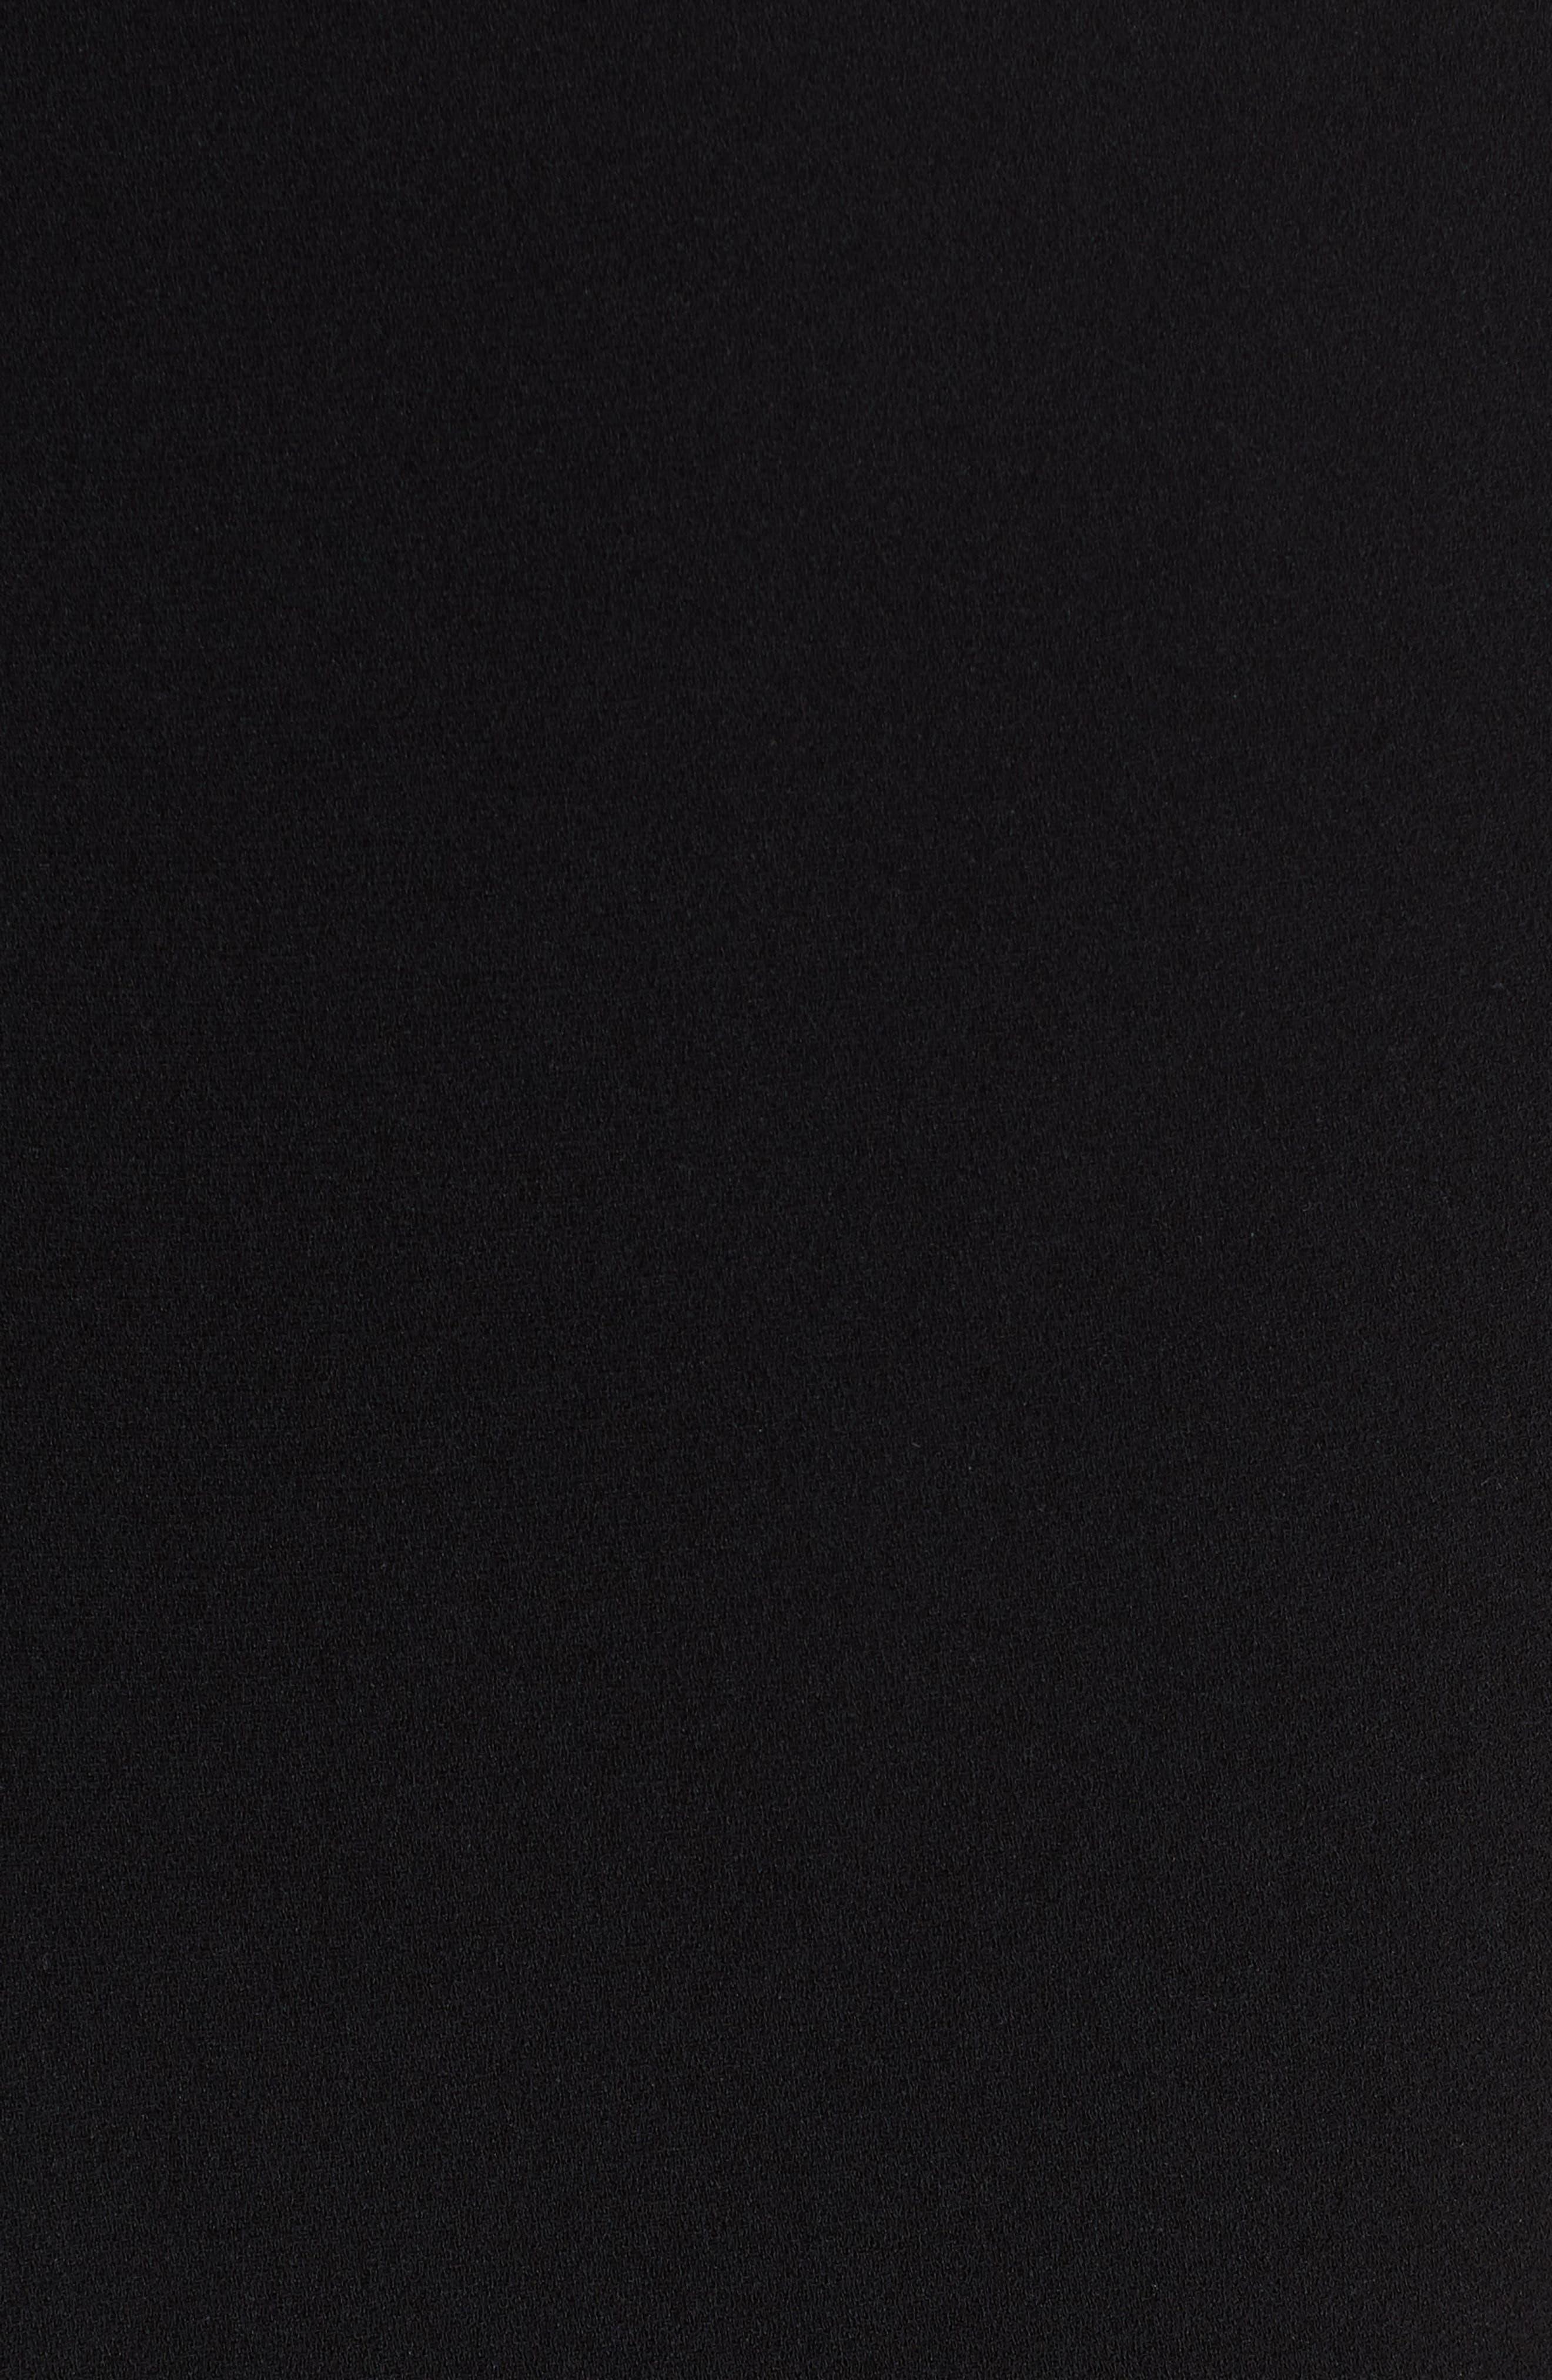 Sleeveless Peplum Top,                             Alternate thumbnail 5, color,                             BLACK